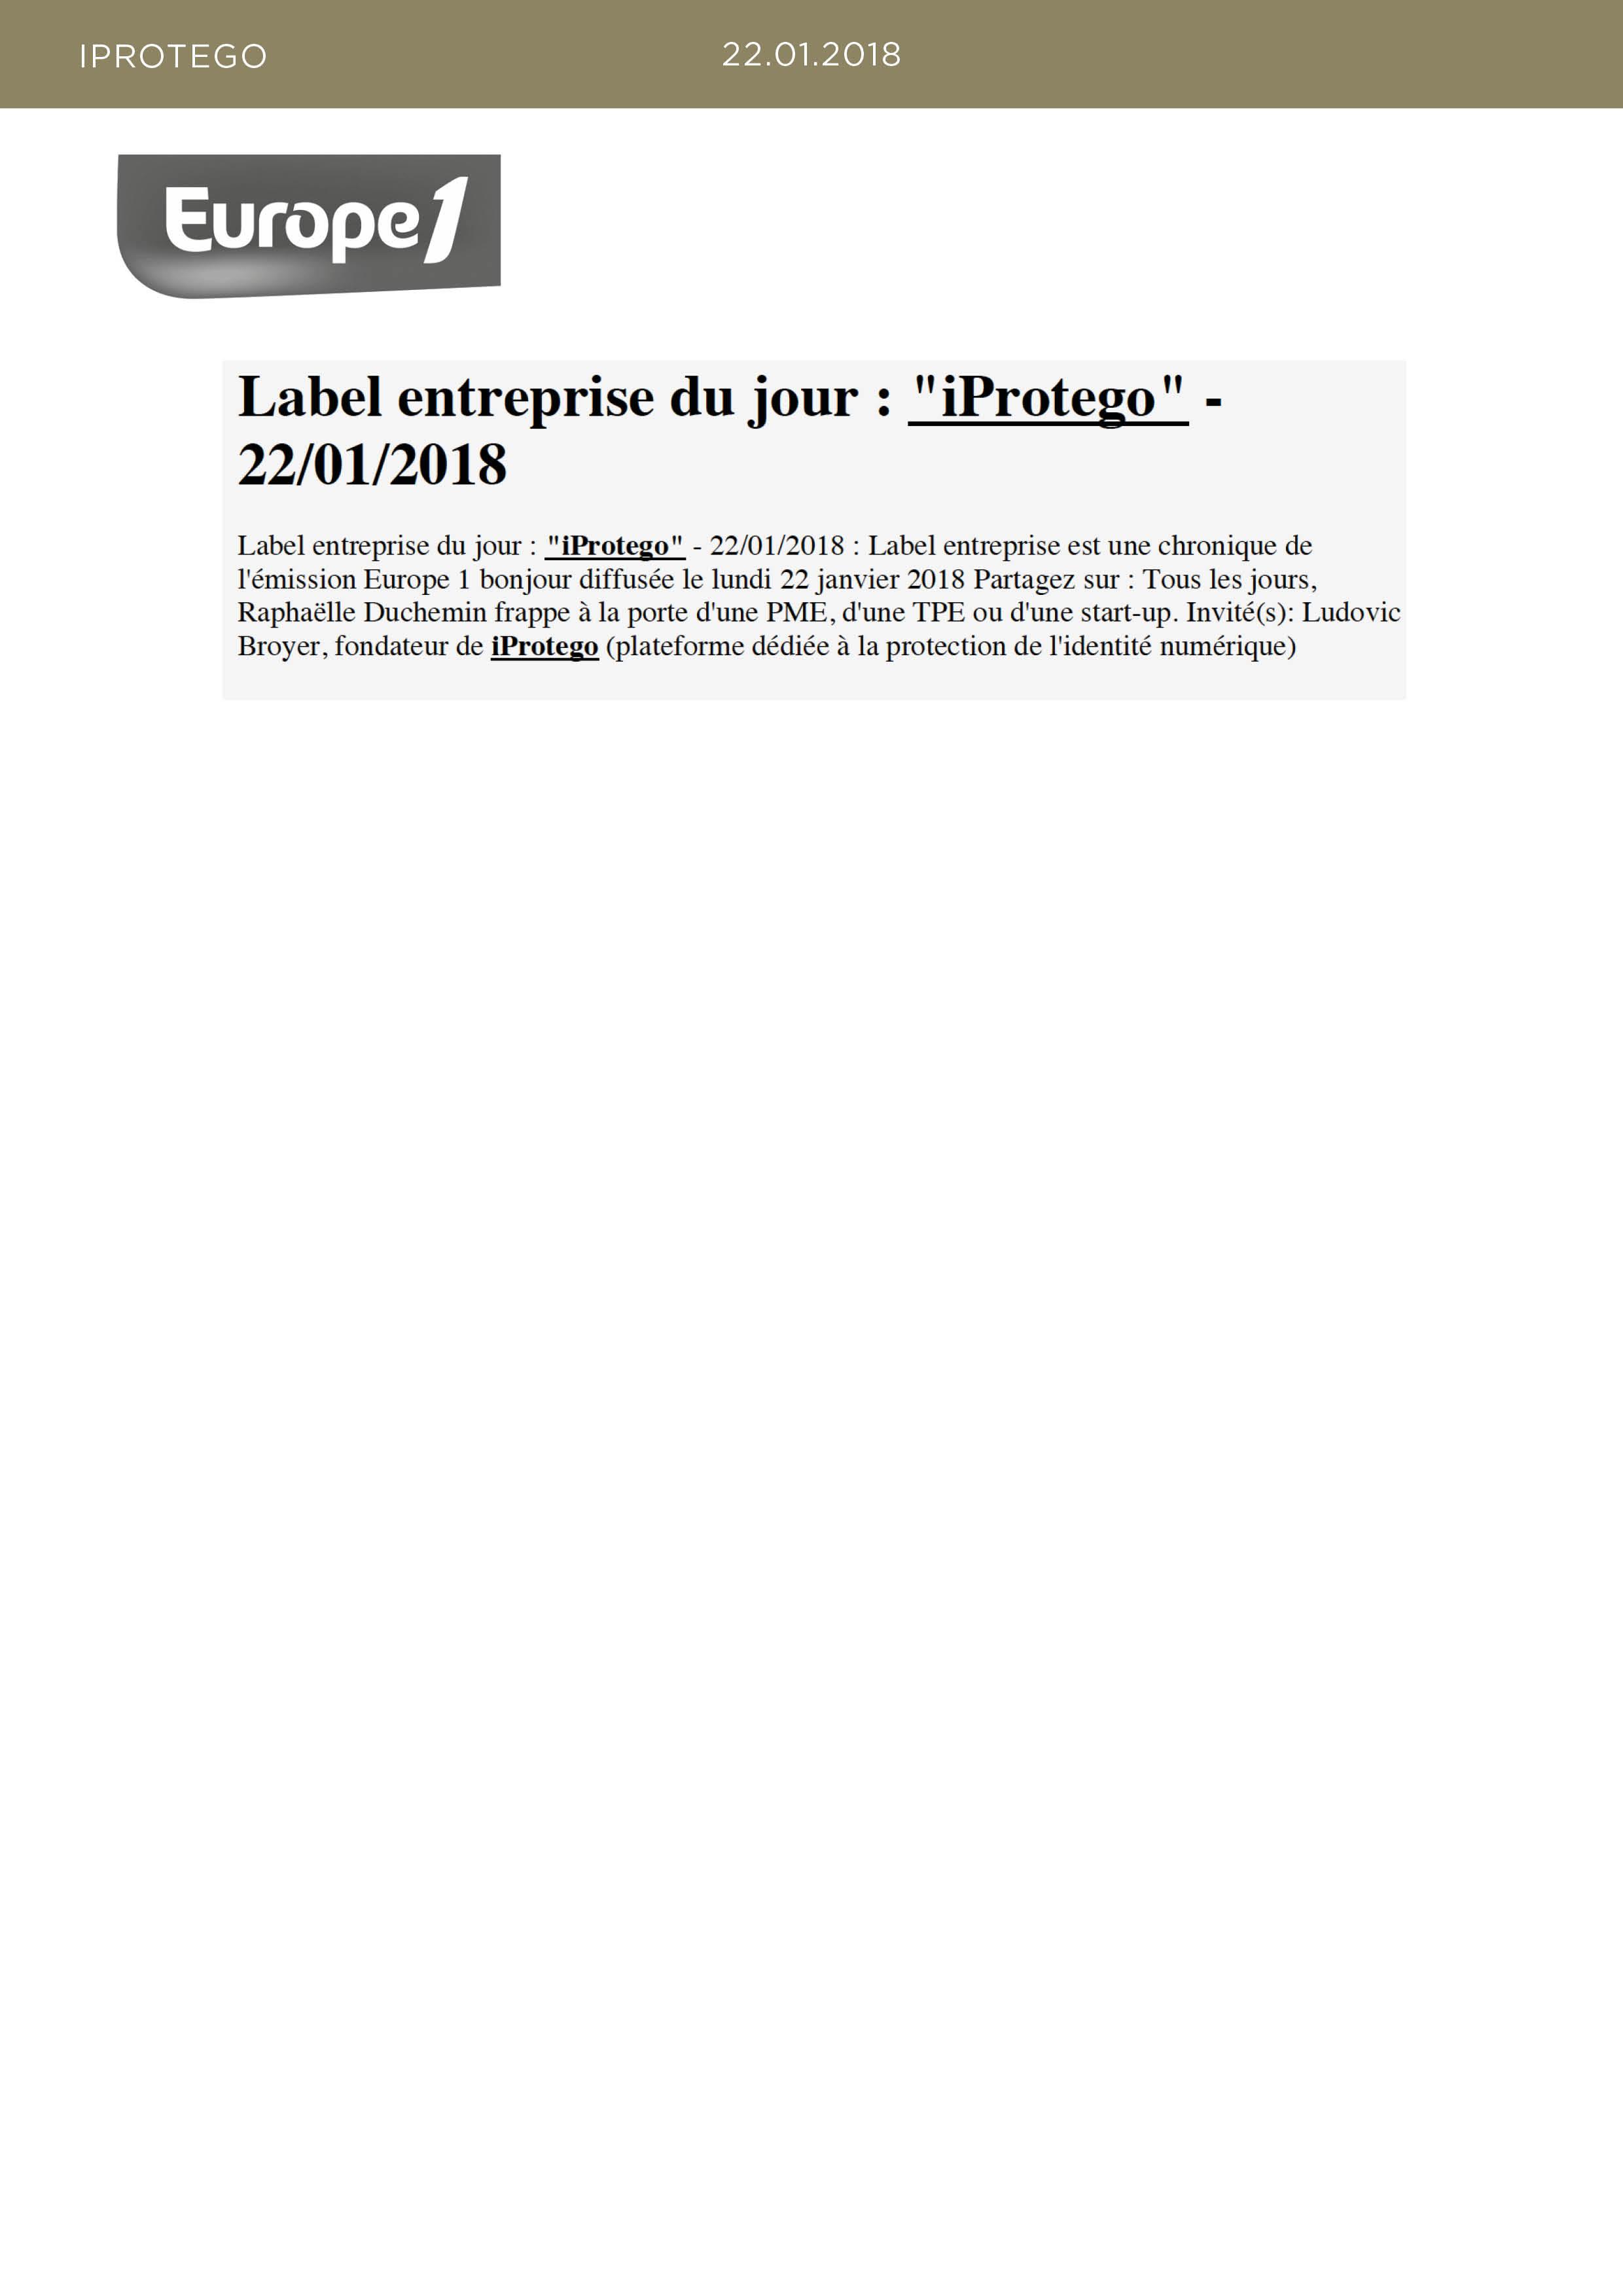 BOOKMEDIA_JANV_WEB38.jpg